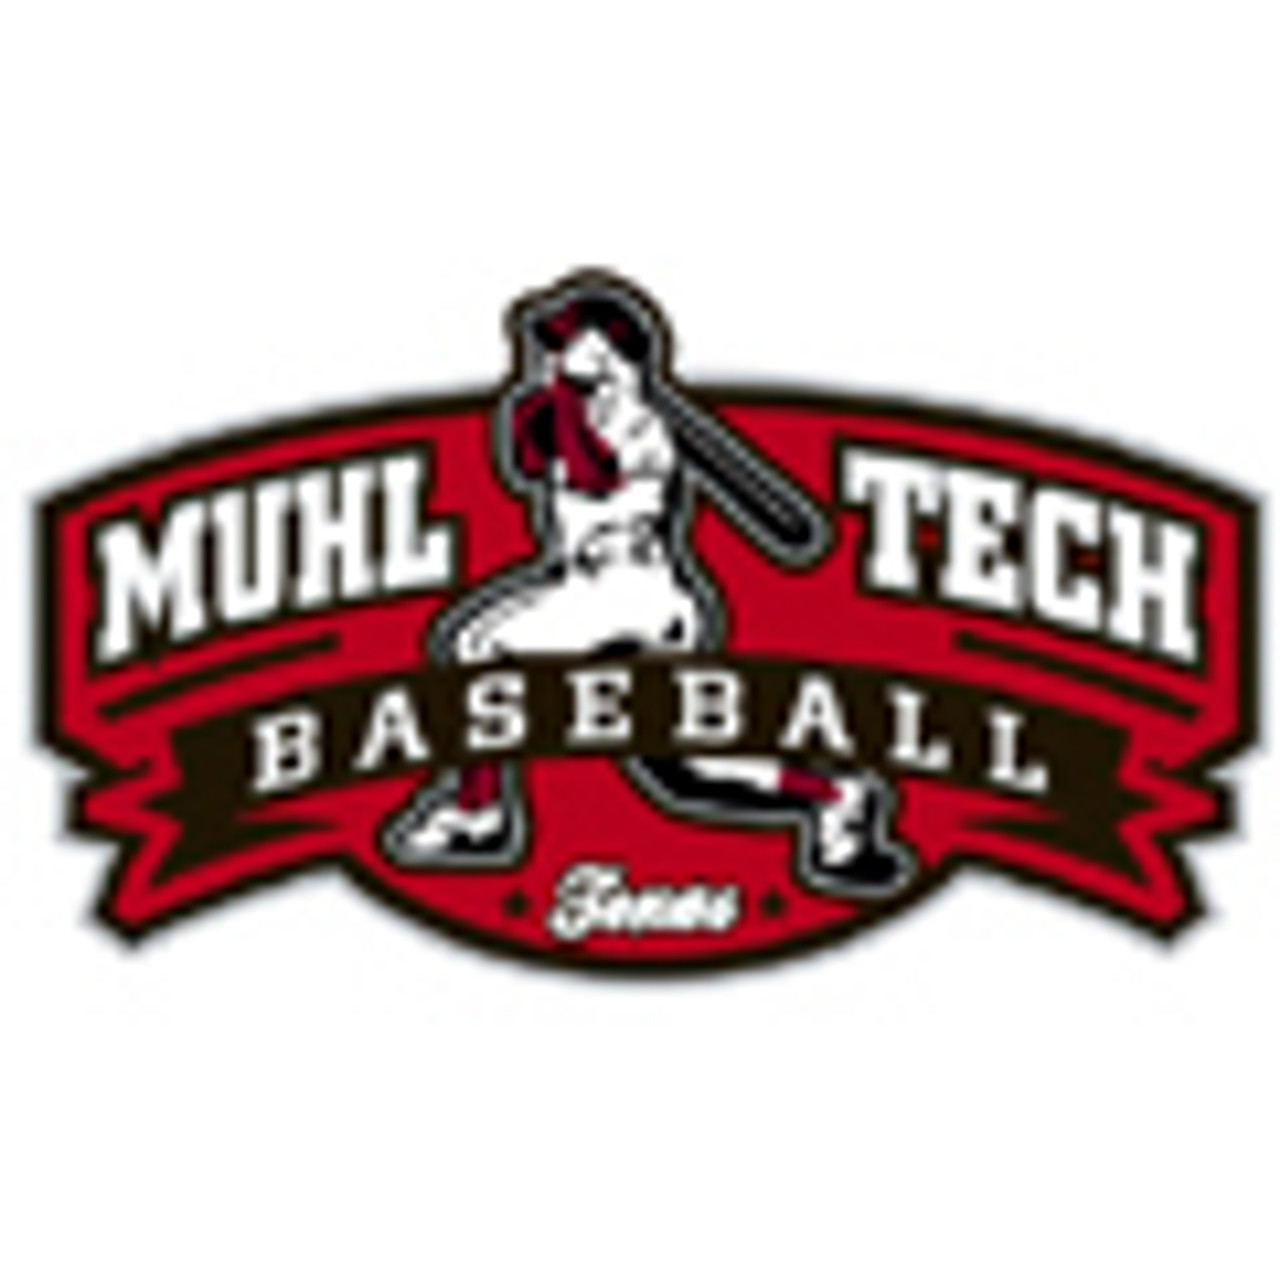 Muhl Fielding Gloves